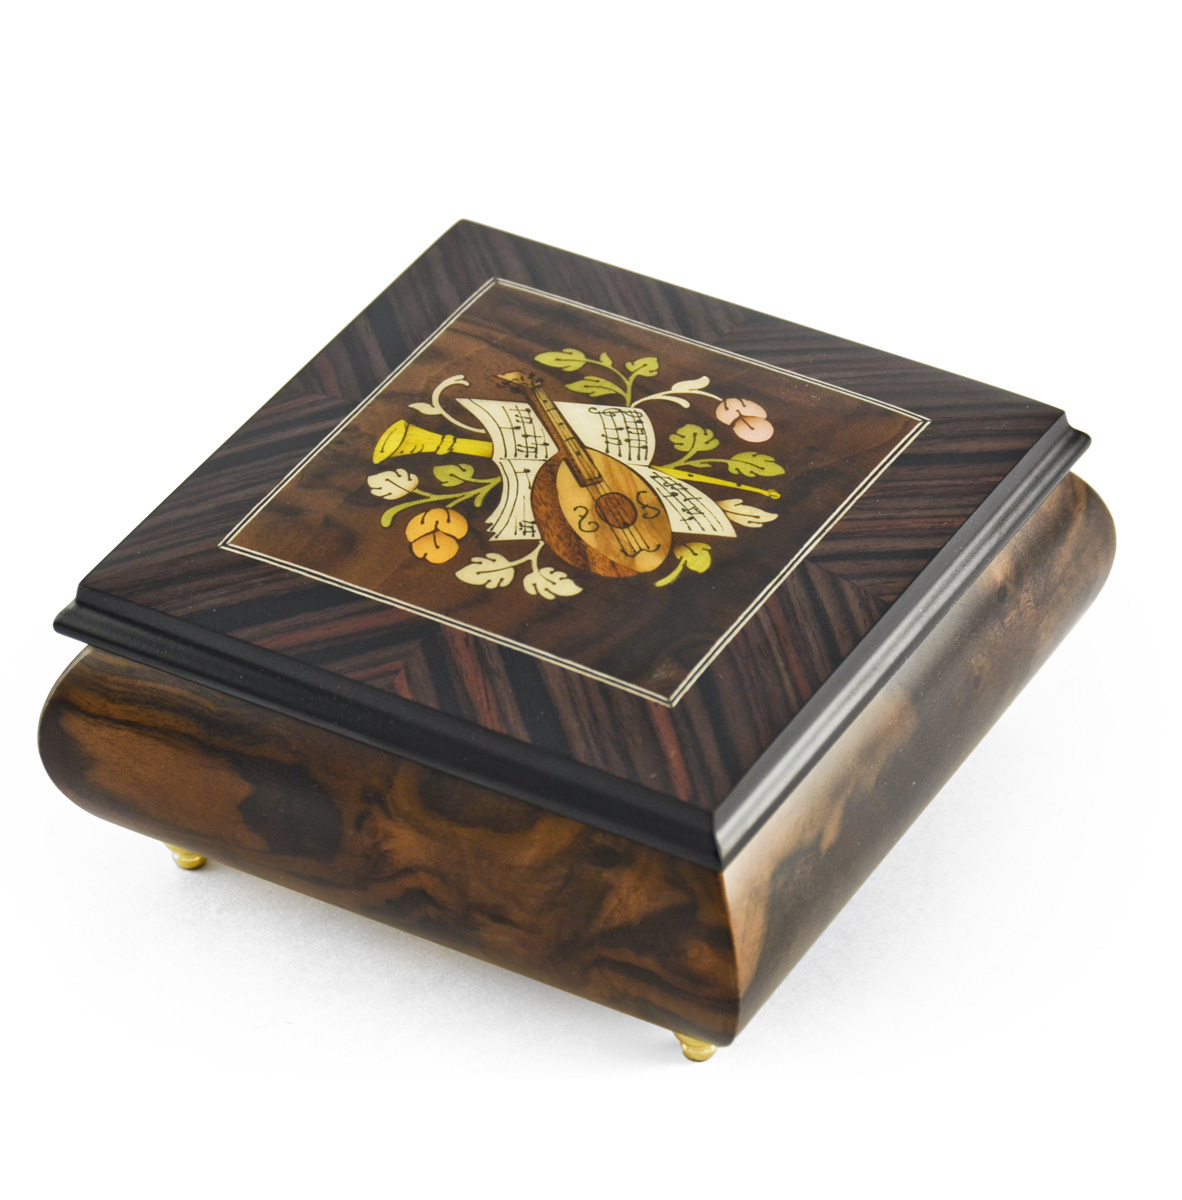 Hand-made 18 Note Italian Jewelry Box with Mandolin Wood Inlay